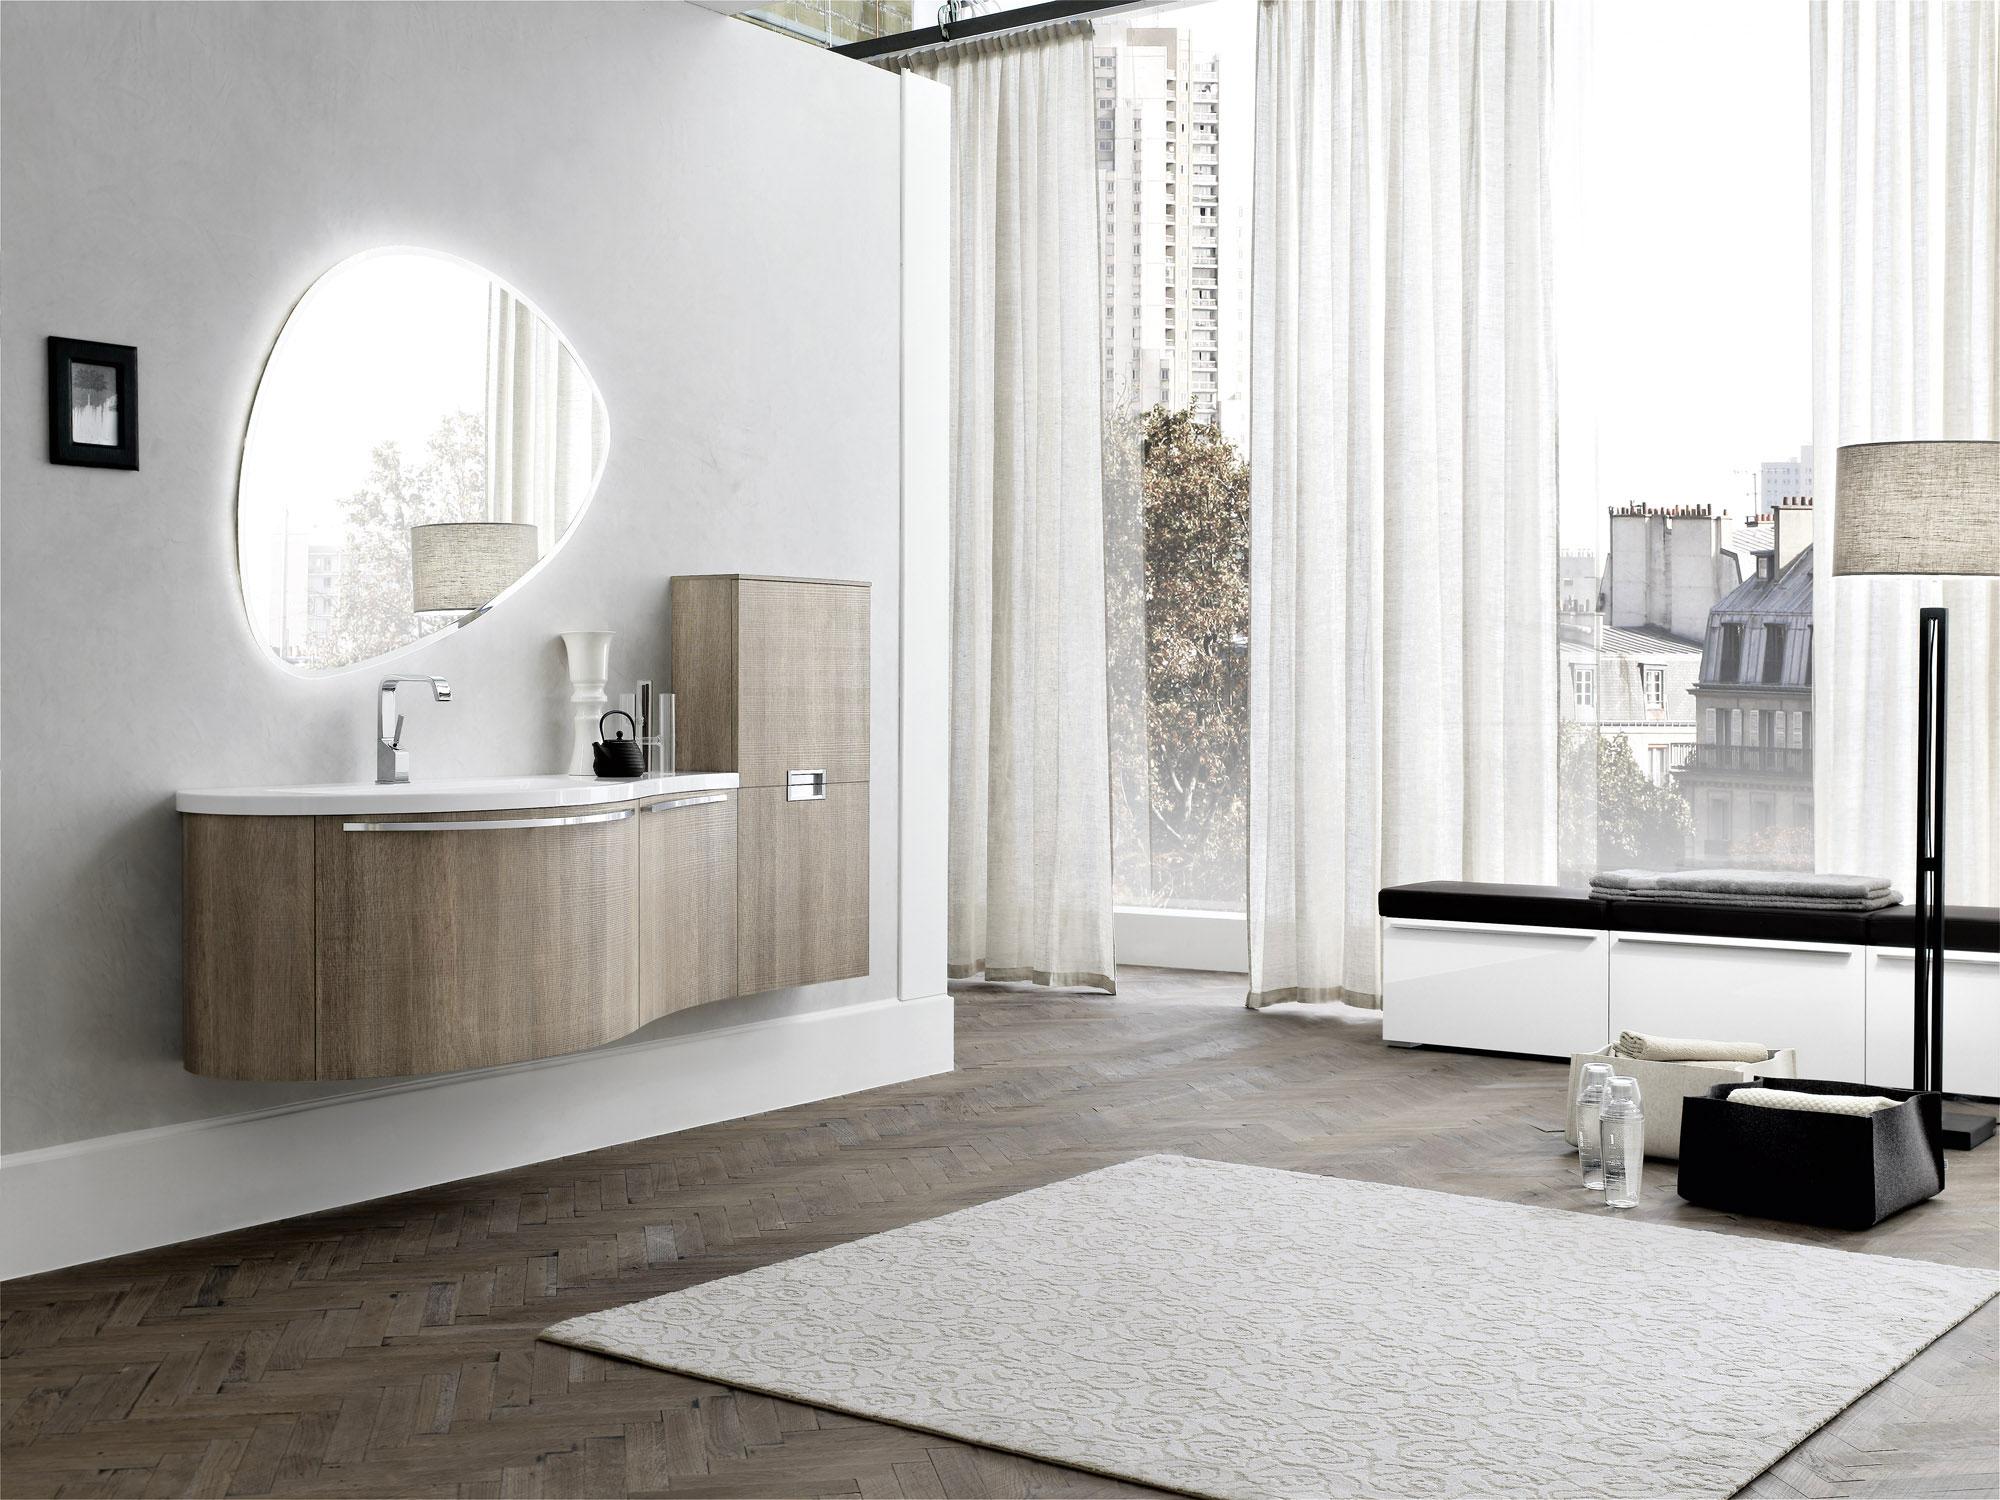 inka - arbi - centro mobili - Arbi Arredo Bagno Prezzi